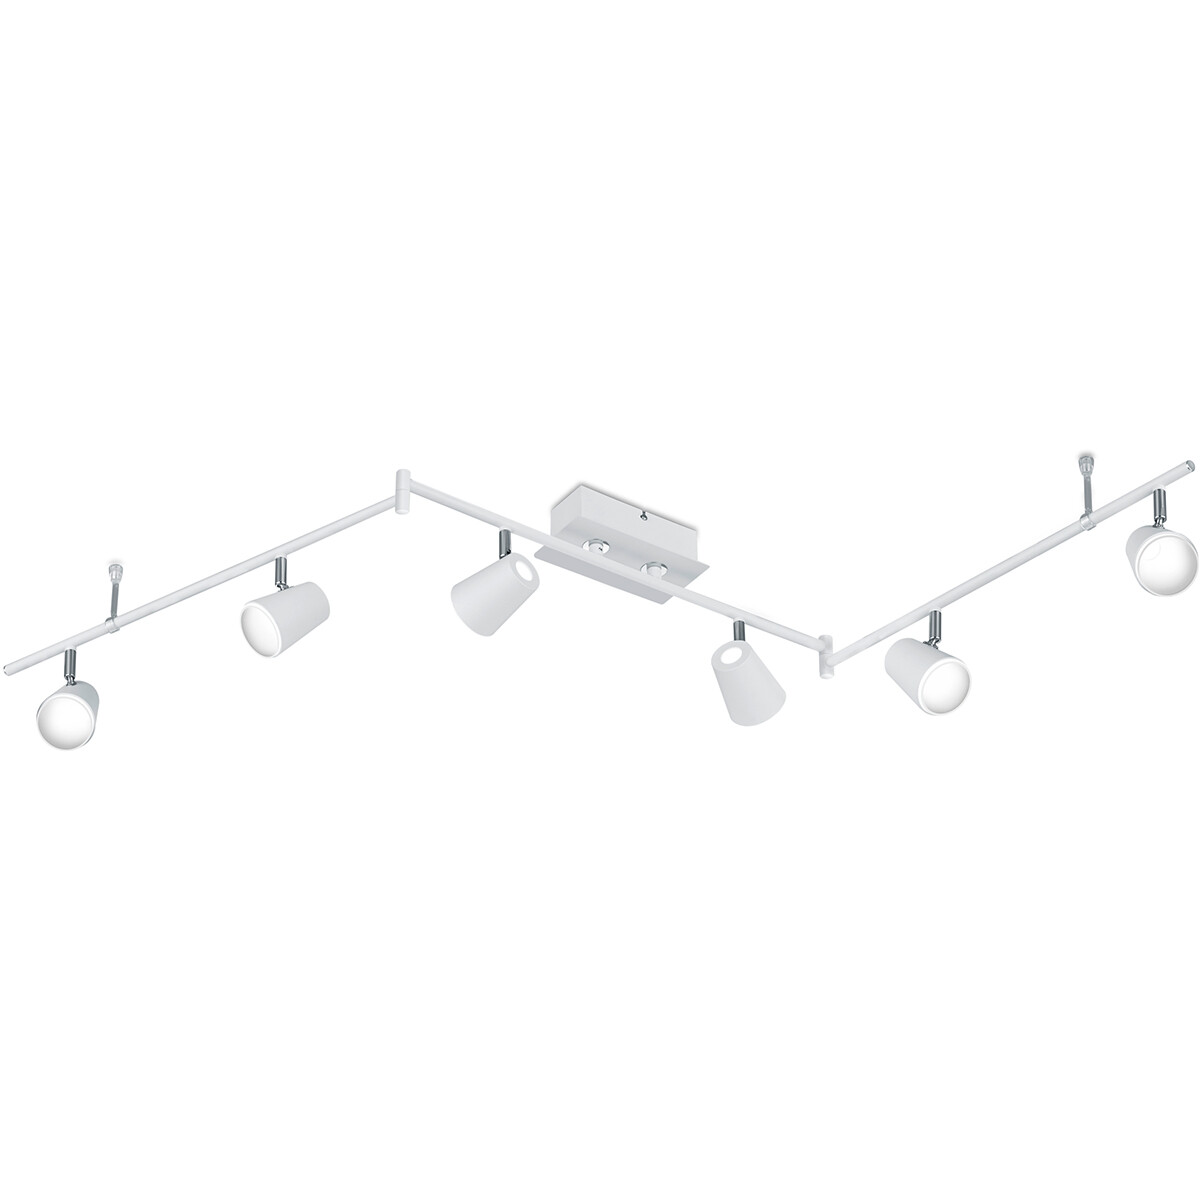 LED Plafondspot - Trion Narca - 36W - Warm Wit 3000K - 6-lichts - Rechthoek - Mat Wit - Aluminium